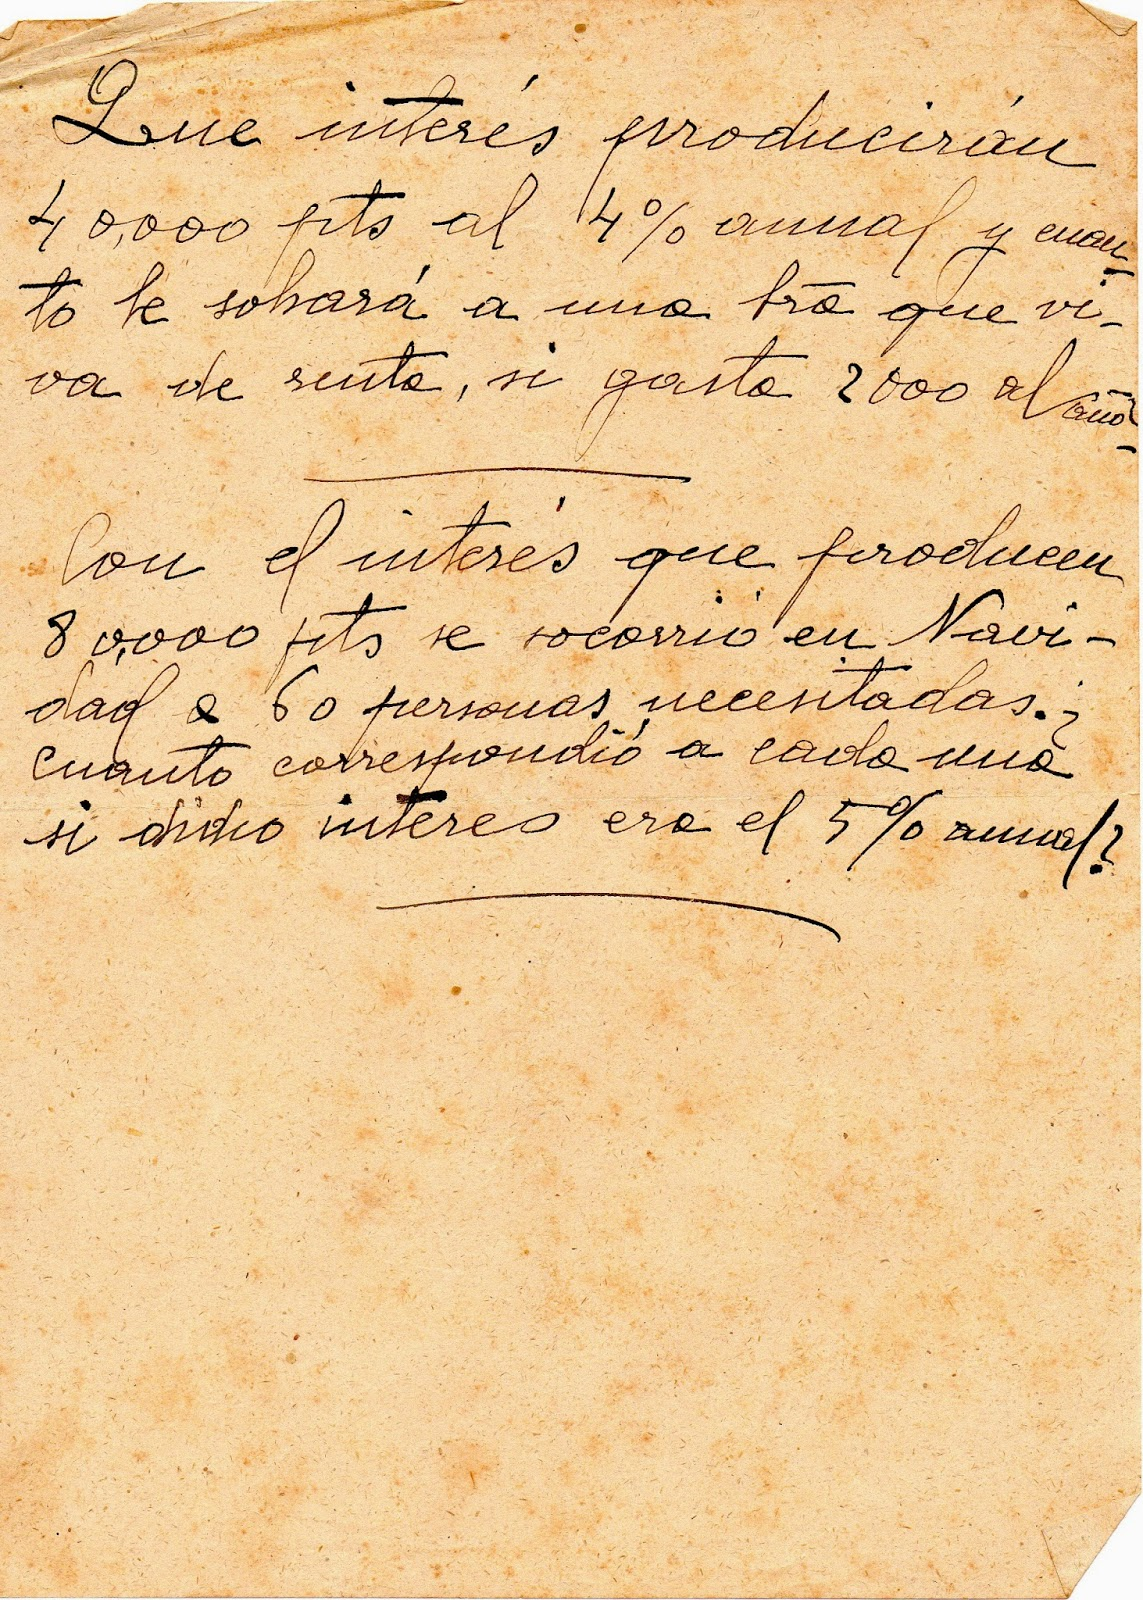 Melitina Álvaro Blázquez - Material escolar - 1933-1940 - Problemas aritméticos